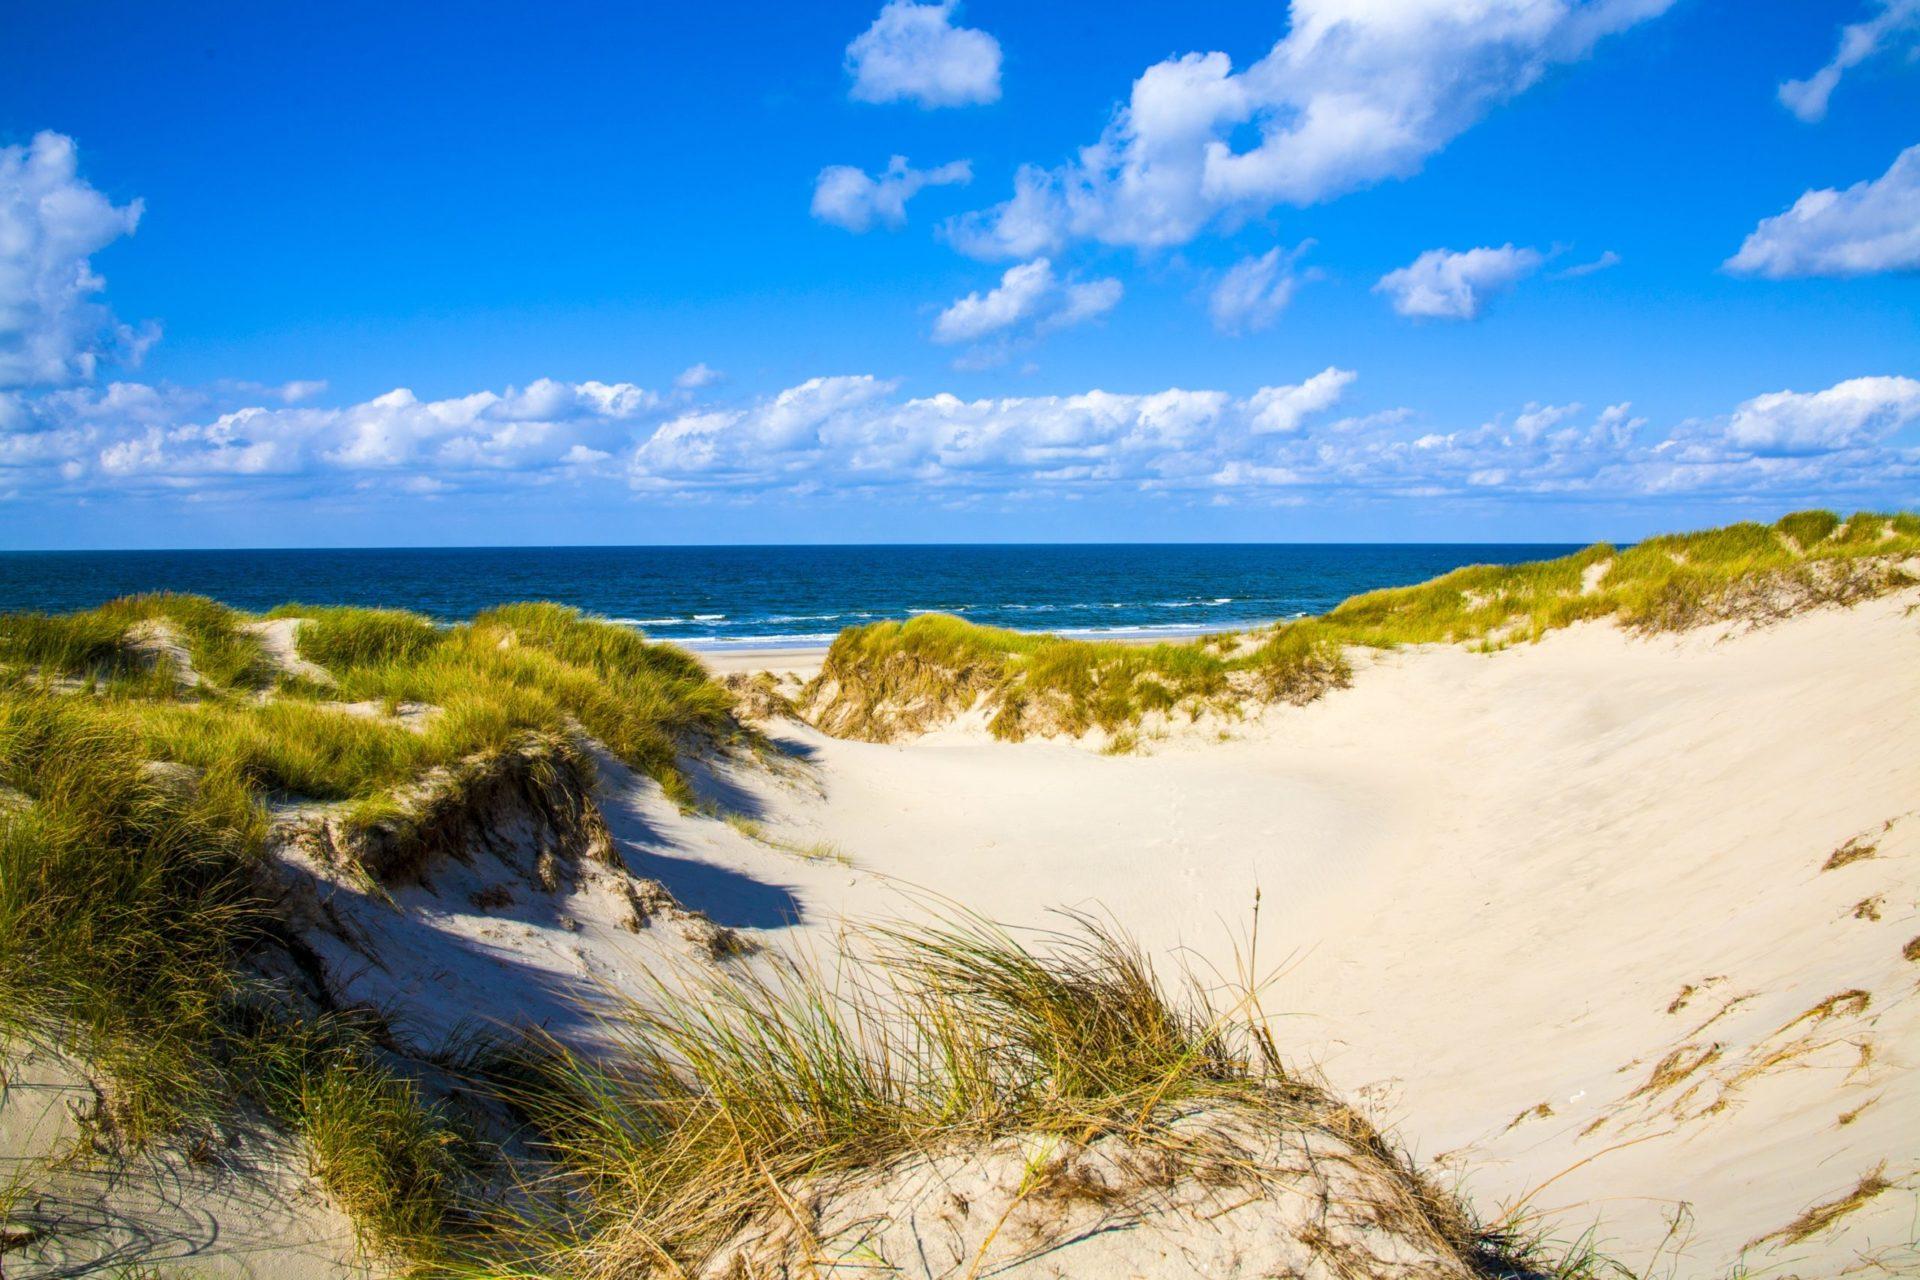 Wassertemperatur Dänemark: Sanddünen mit Dünengras an der dänischen Nordseeküste